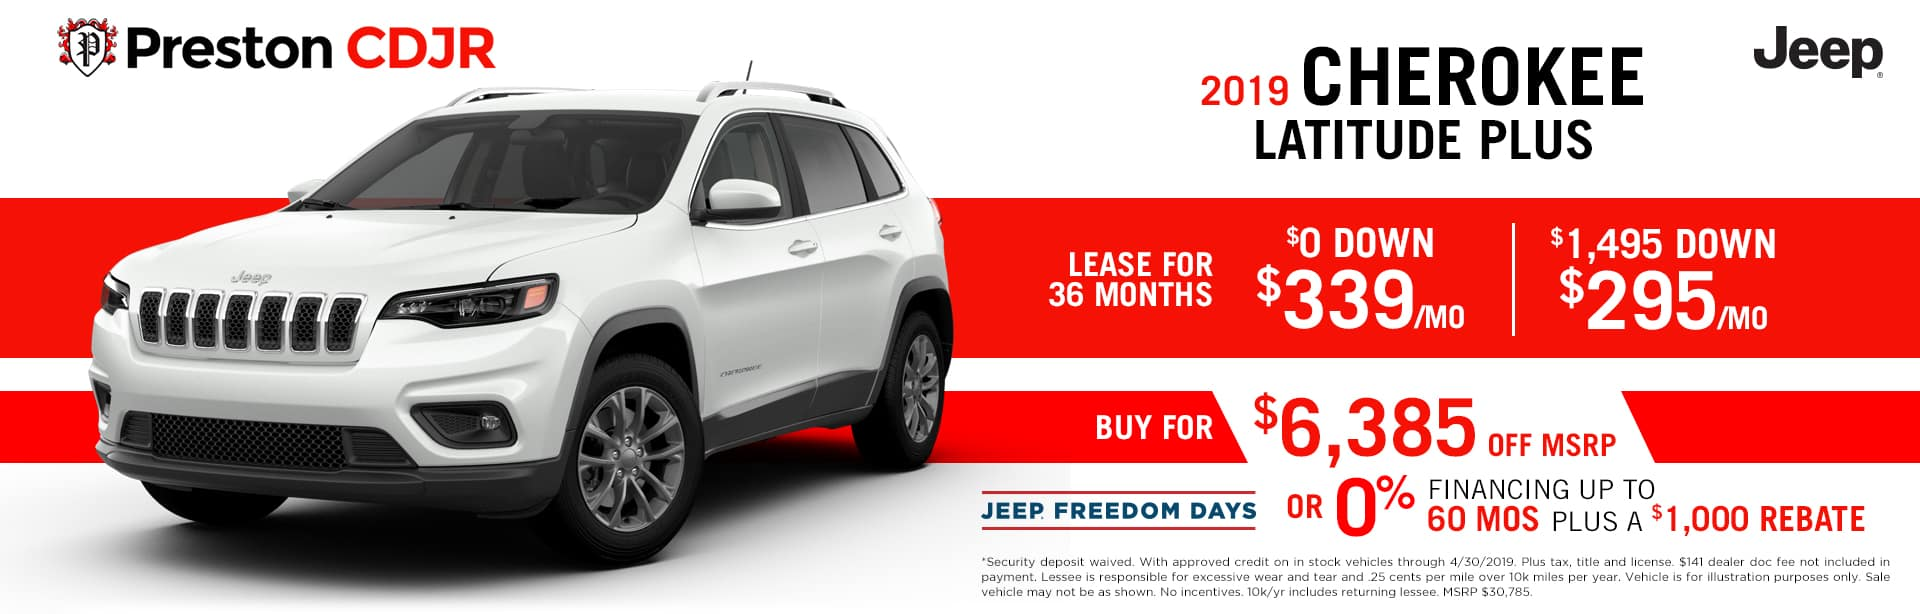 deal jeep cherokee latitude